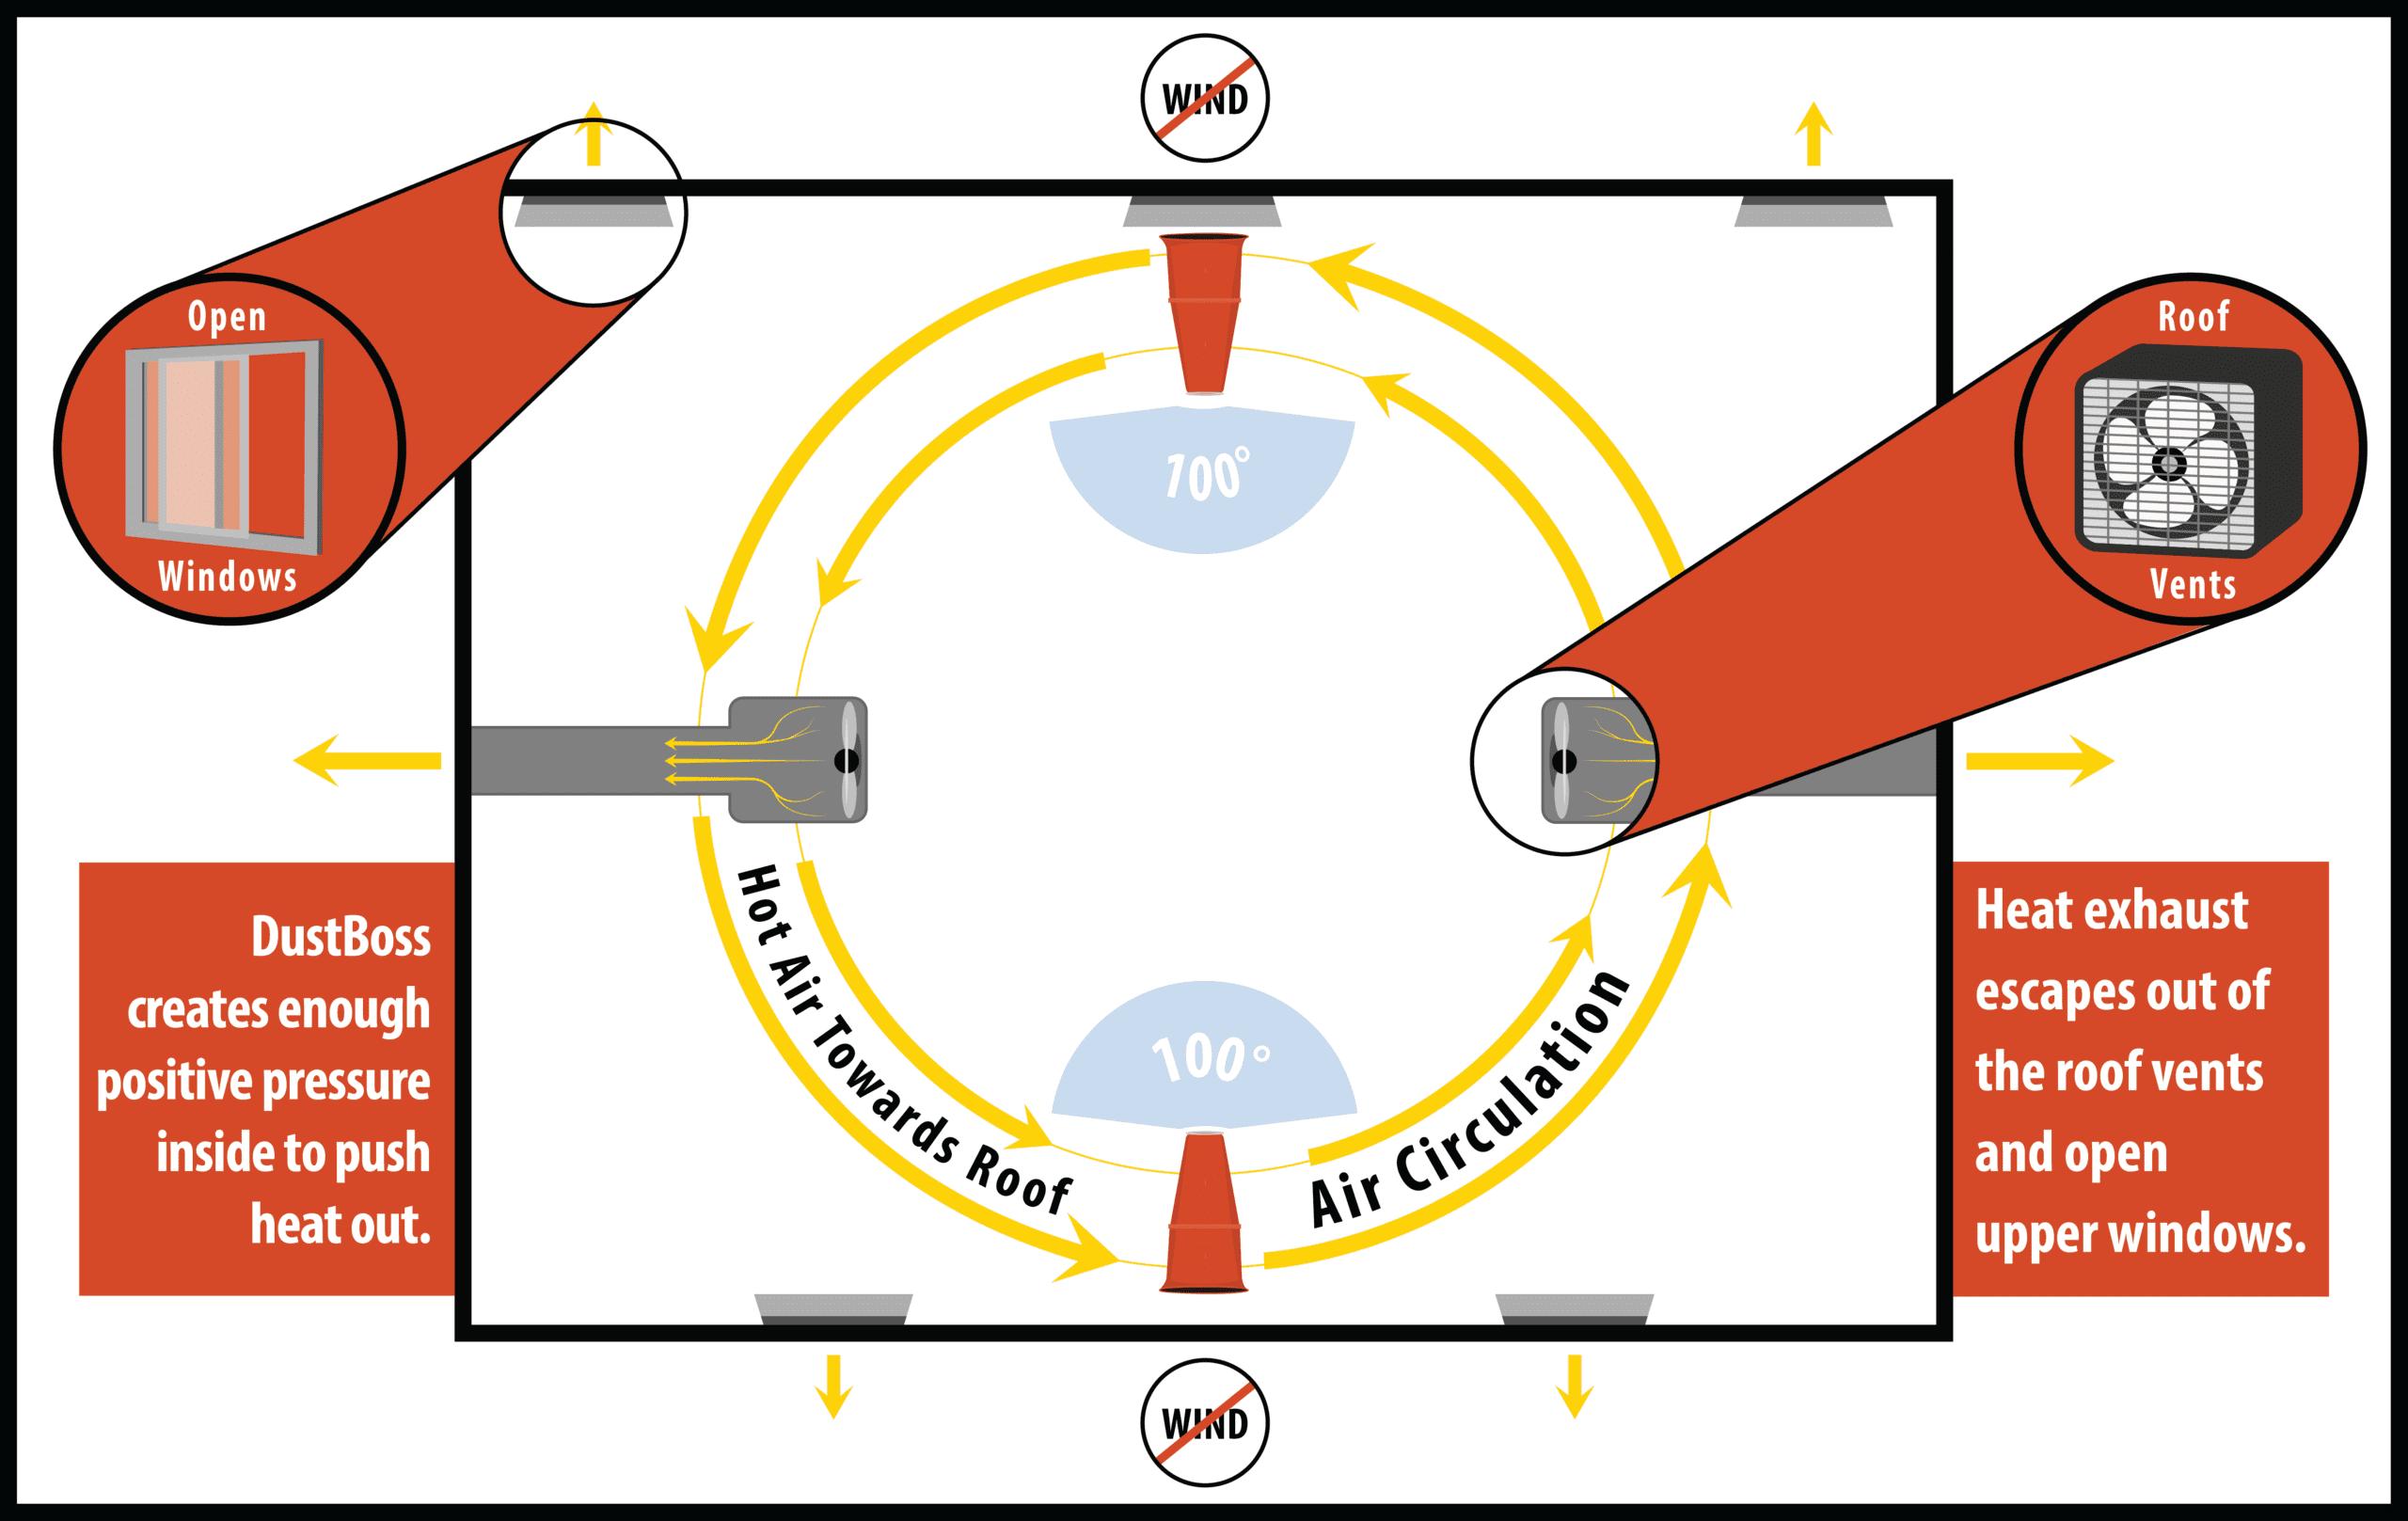 Temperature Control and Positive Air Diagram